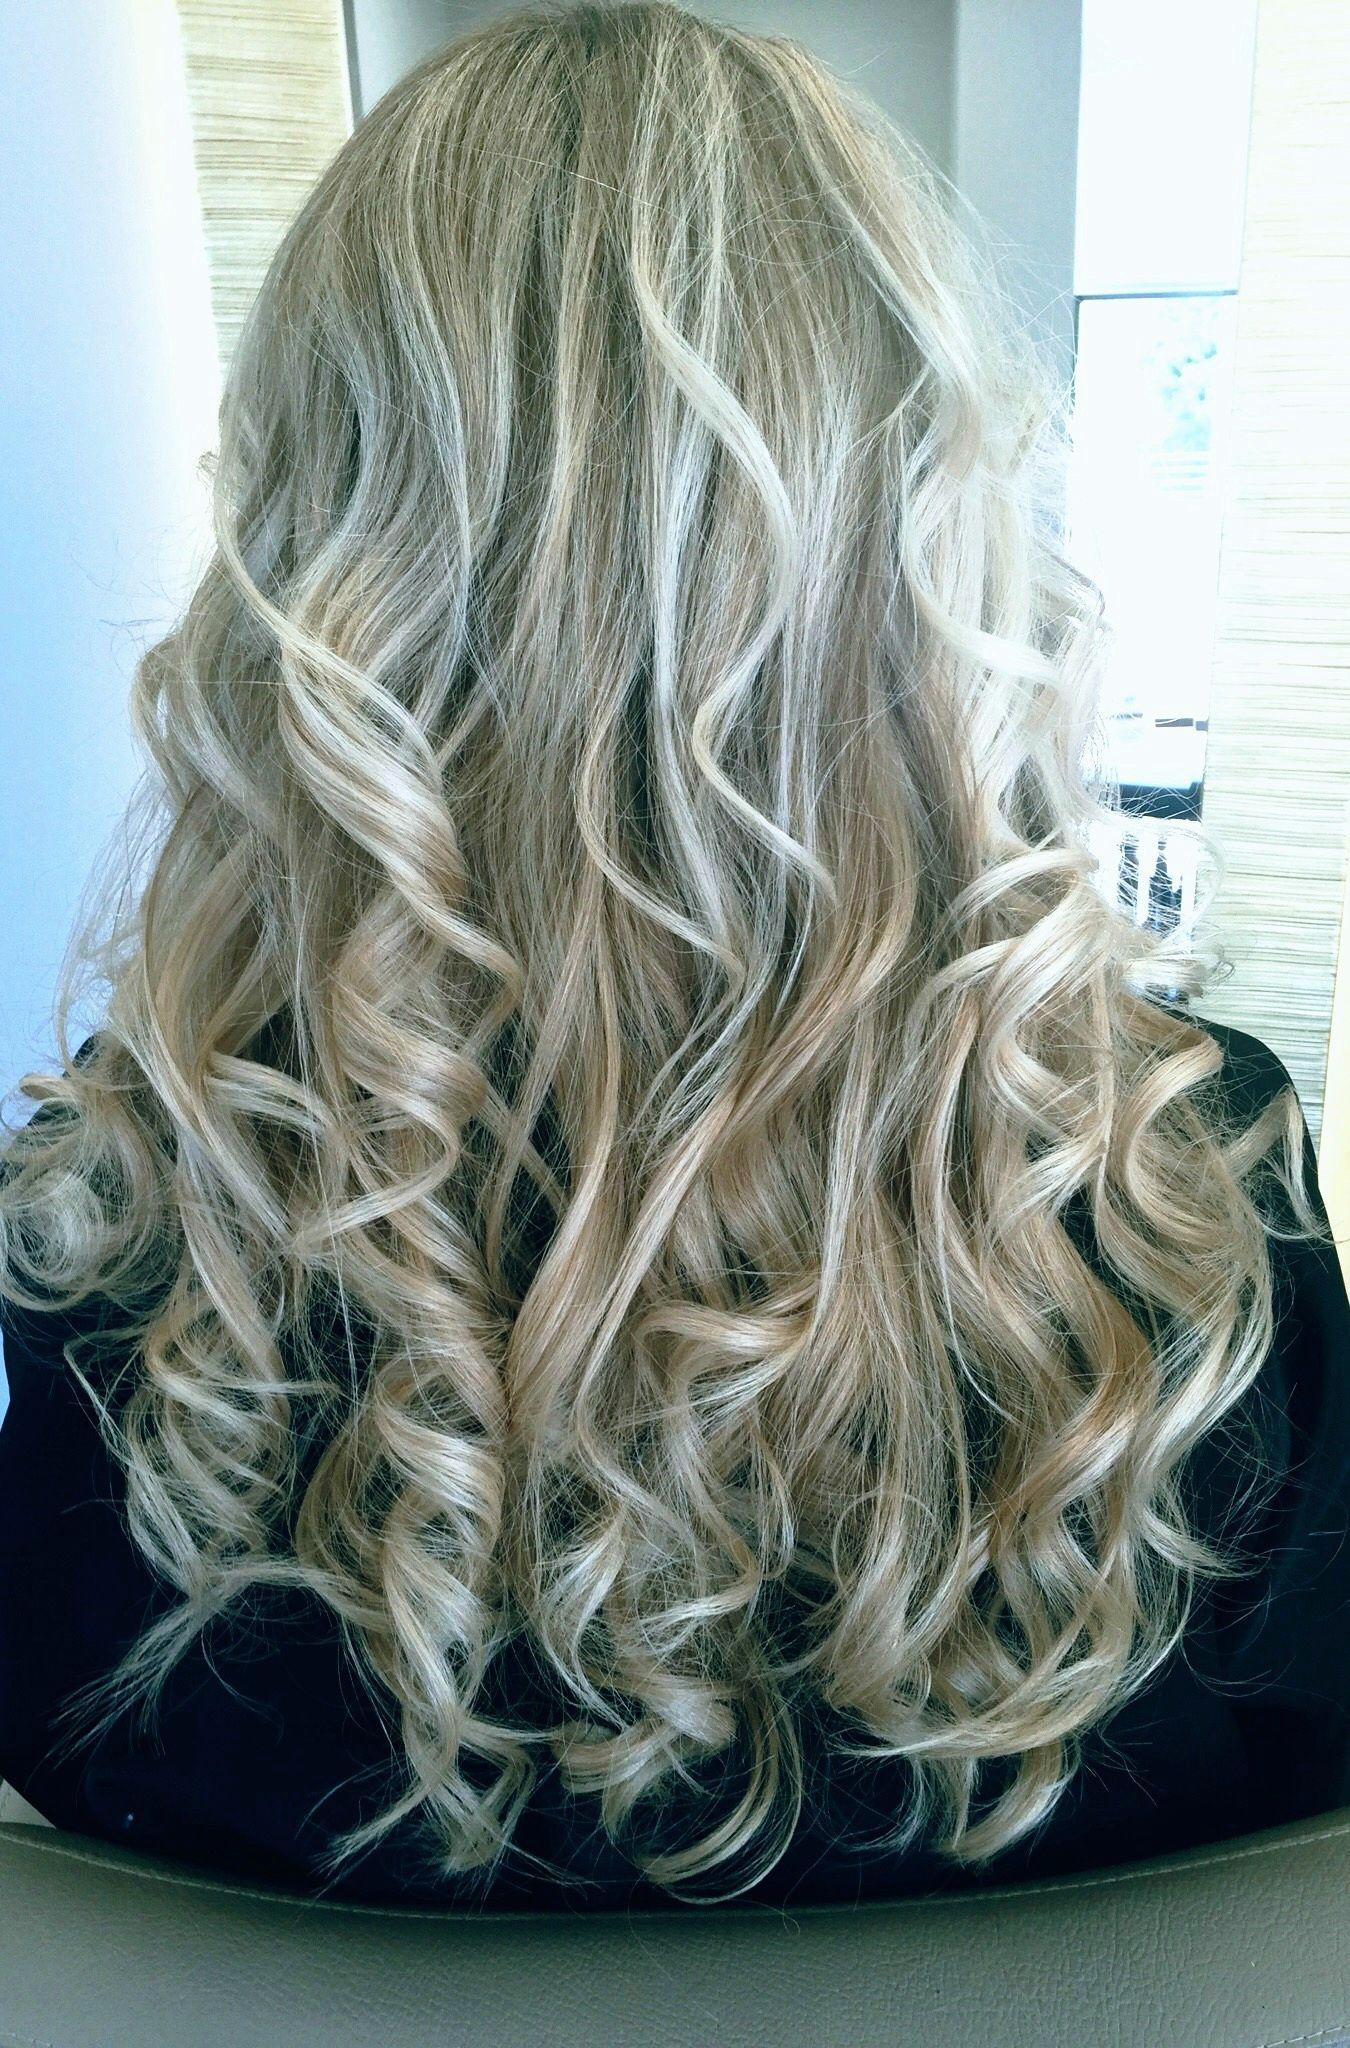 Curls Balayage Salon Coiffure Hairbrushing Montpellier Hair Inspiration Hair Styles Balayage